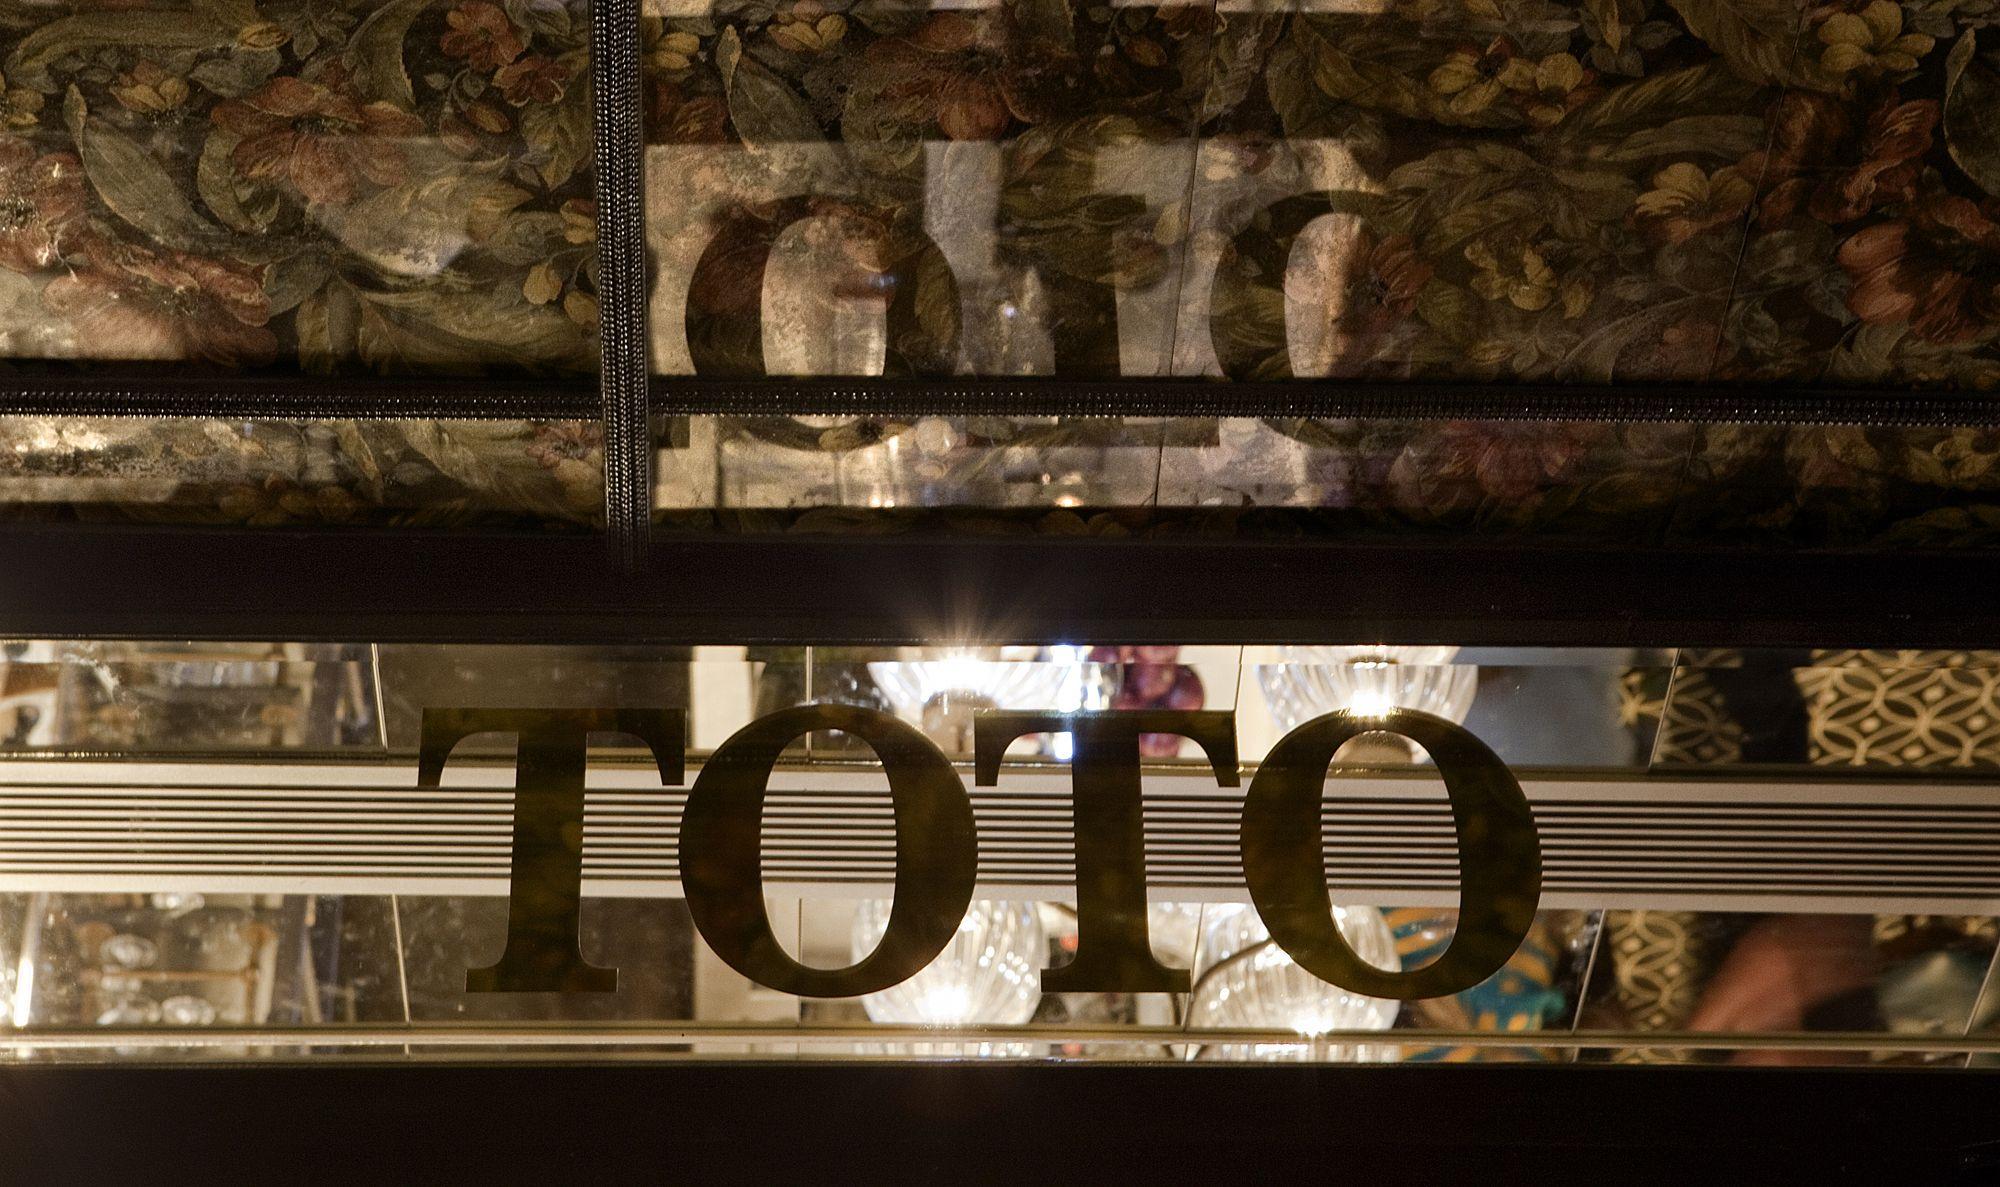 Restaurante Toto en Barcelona #totorestaurante #toto #kitchen #oven ...